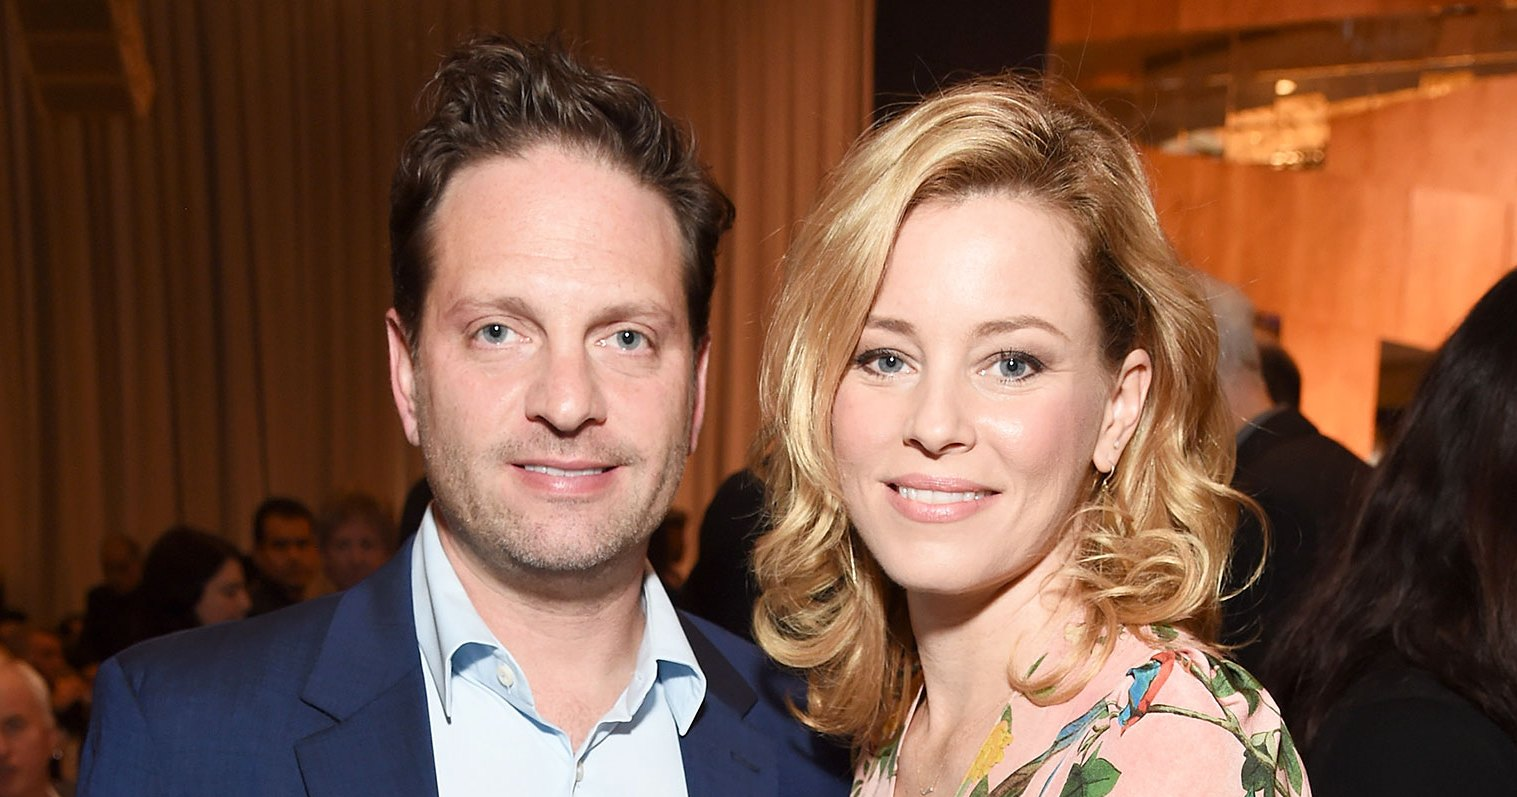 Elizabeth Banks Praises Her Husband Max: 'We Work Very Well Together'